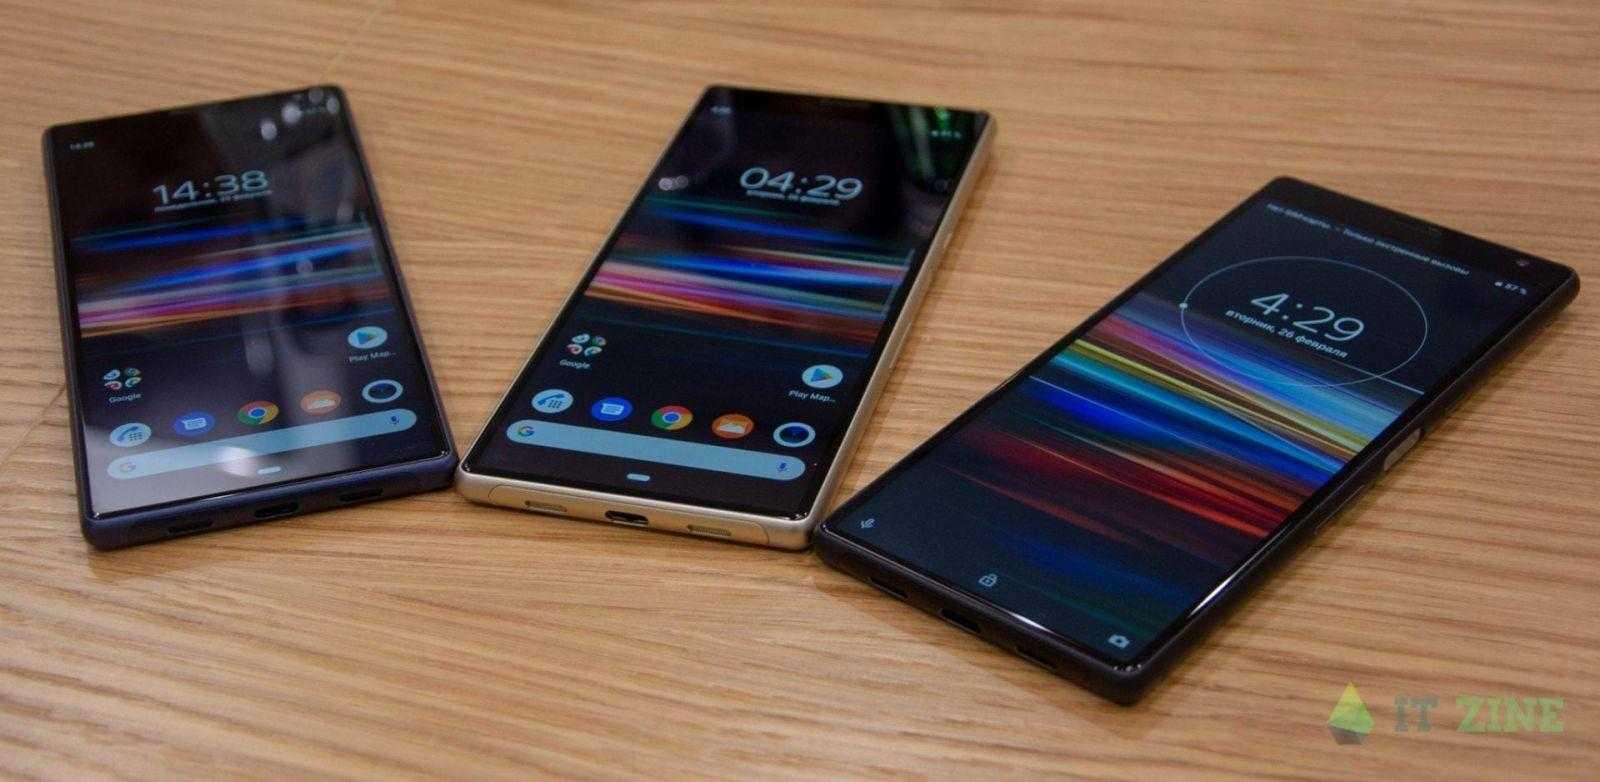 MWC 2019. Sony показала новые смартфоны среднего сегмента Xperia 10 и 10 Plus (DSC 7012 1)